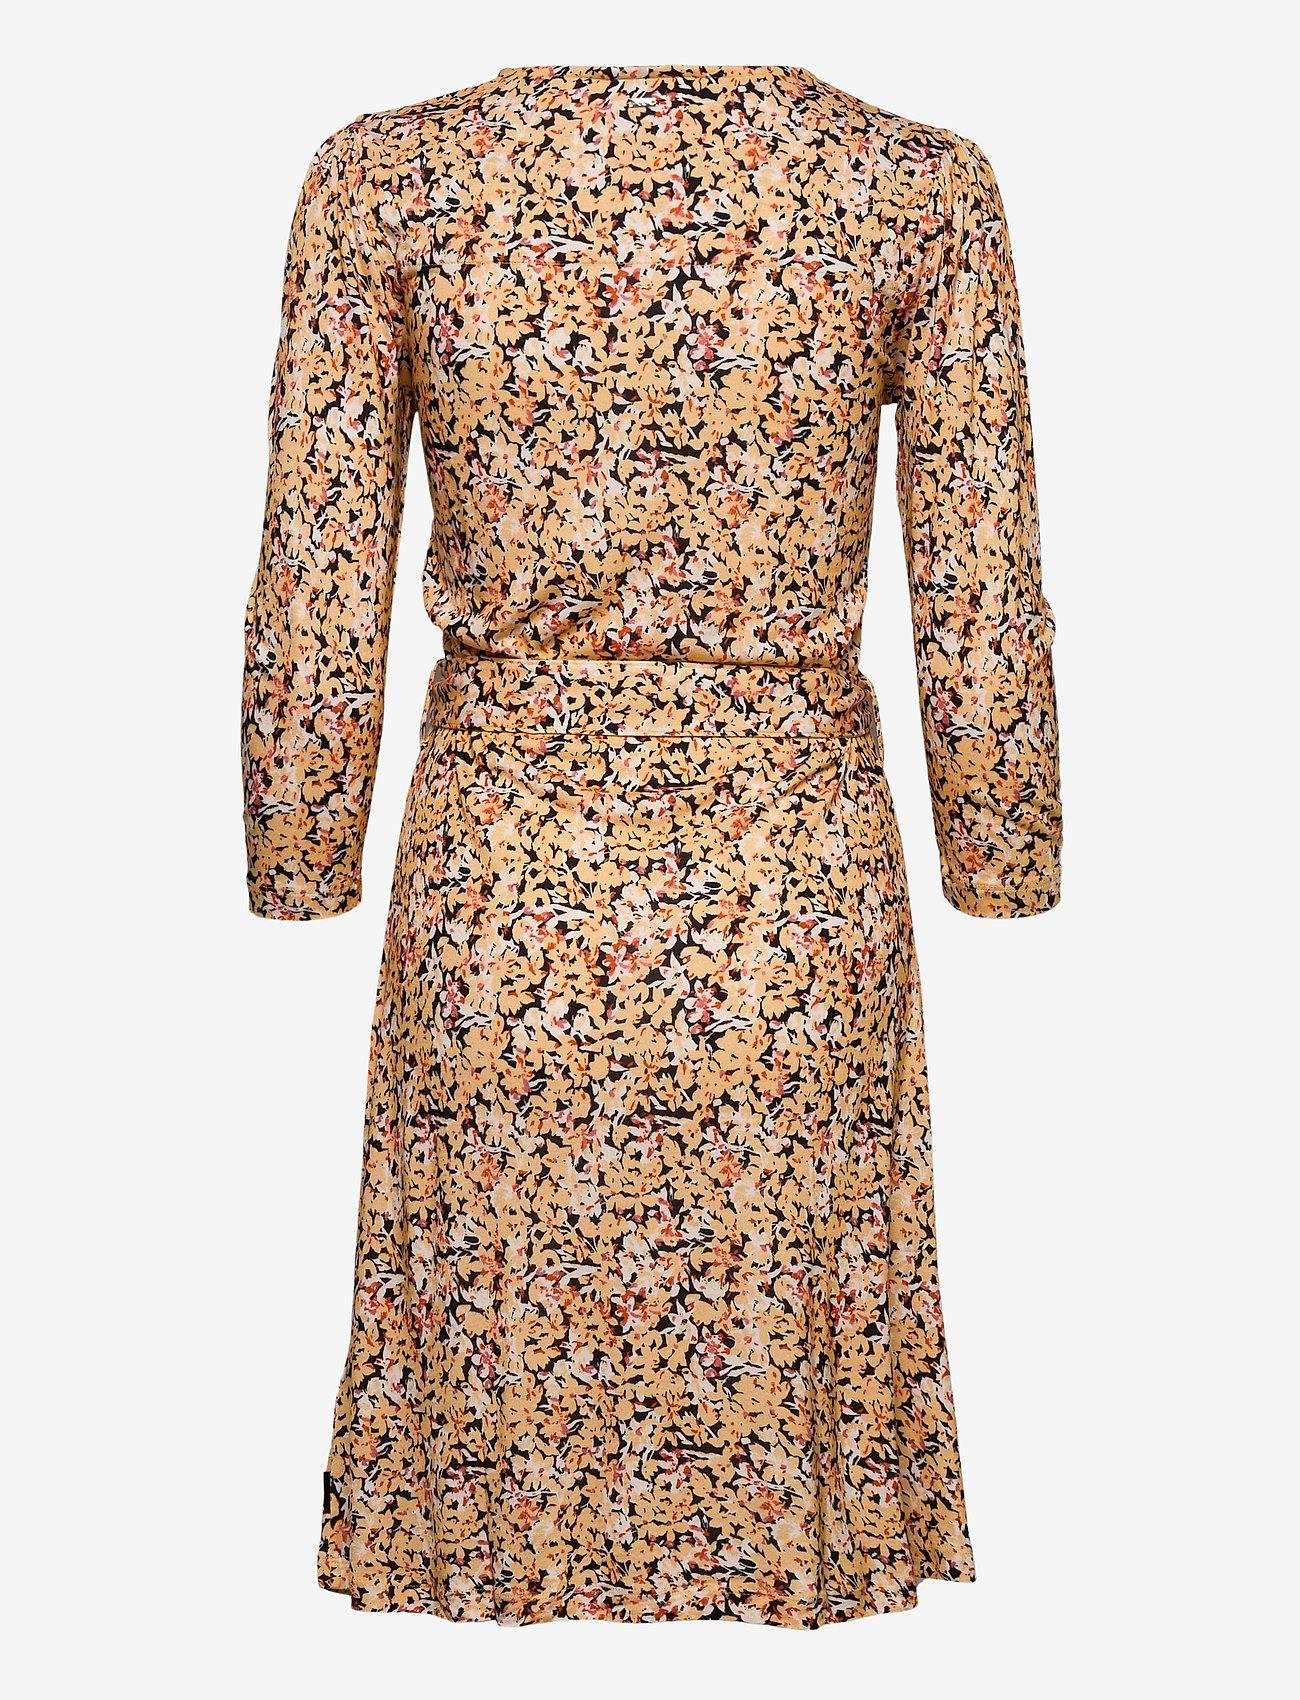 Print 3/4 Slv Jersey Dress (Ditsy Floral - Yellow) (1400 kr) - Calvin Klein